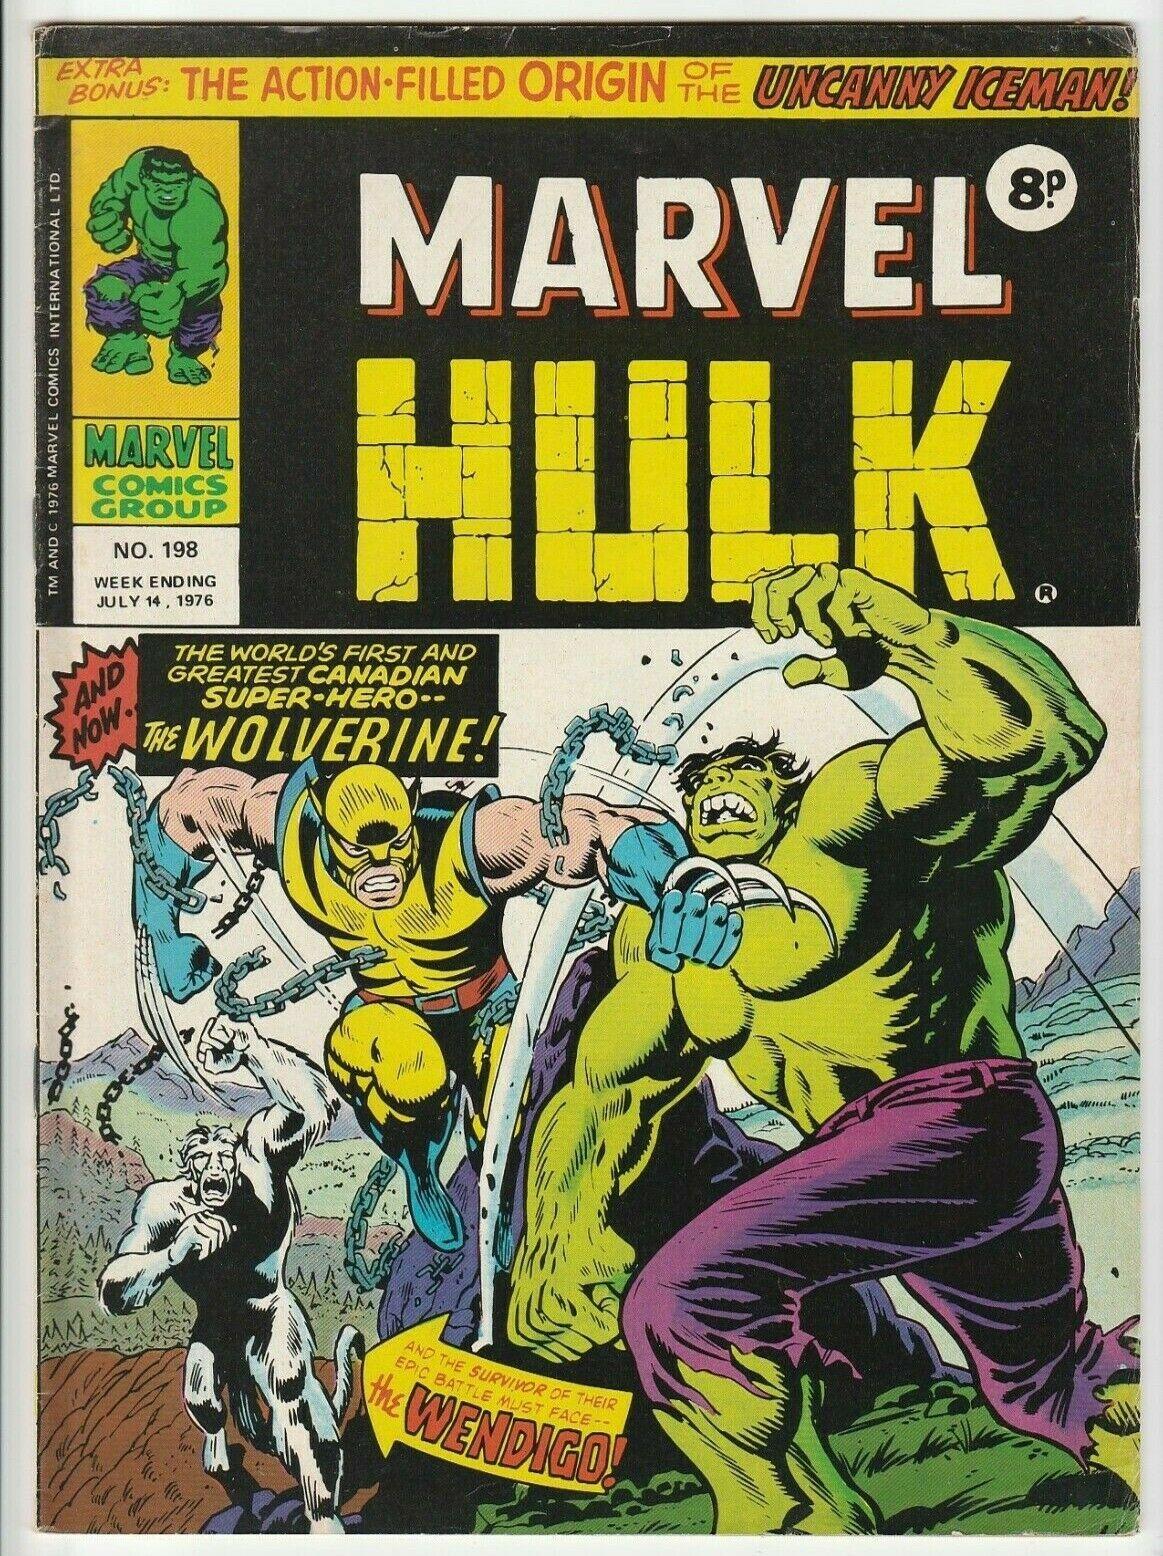 MIGHTY WORLD OF MARVEL Comic # 198 1976 British 1st App Wolverine UK - Hulk 181